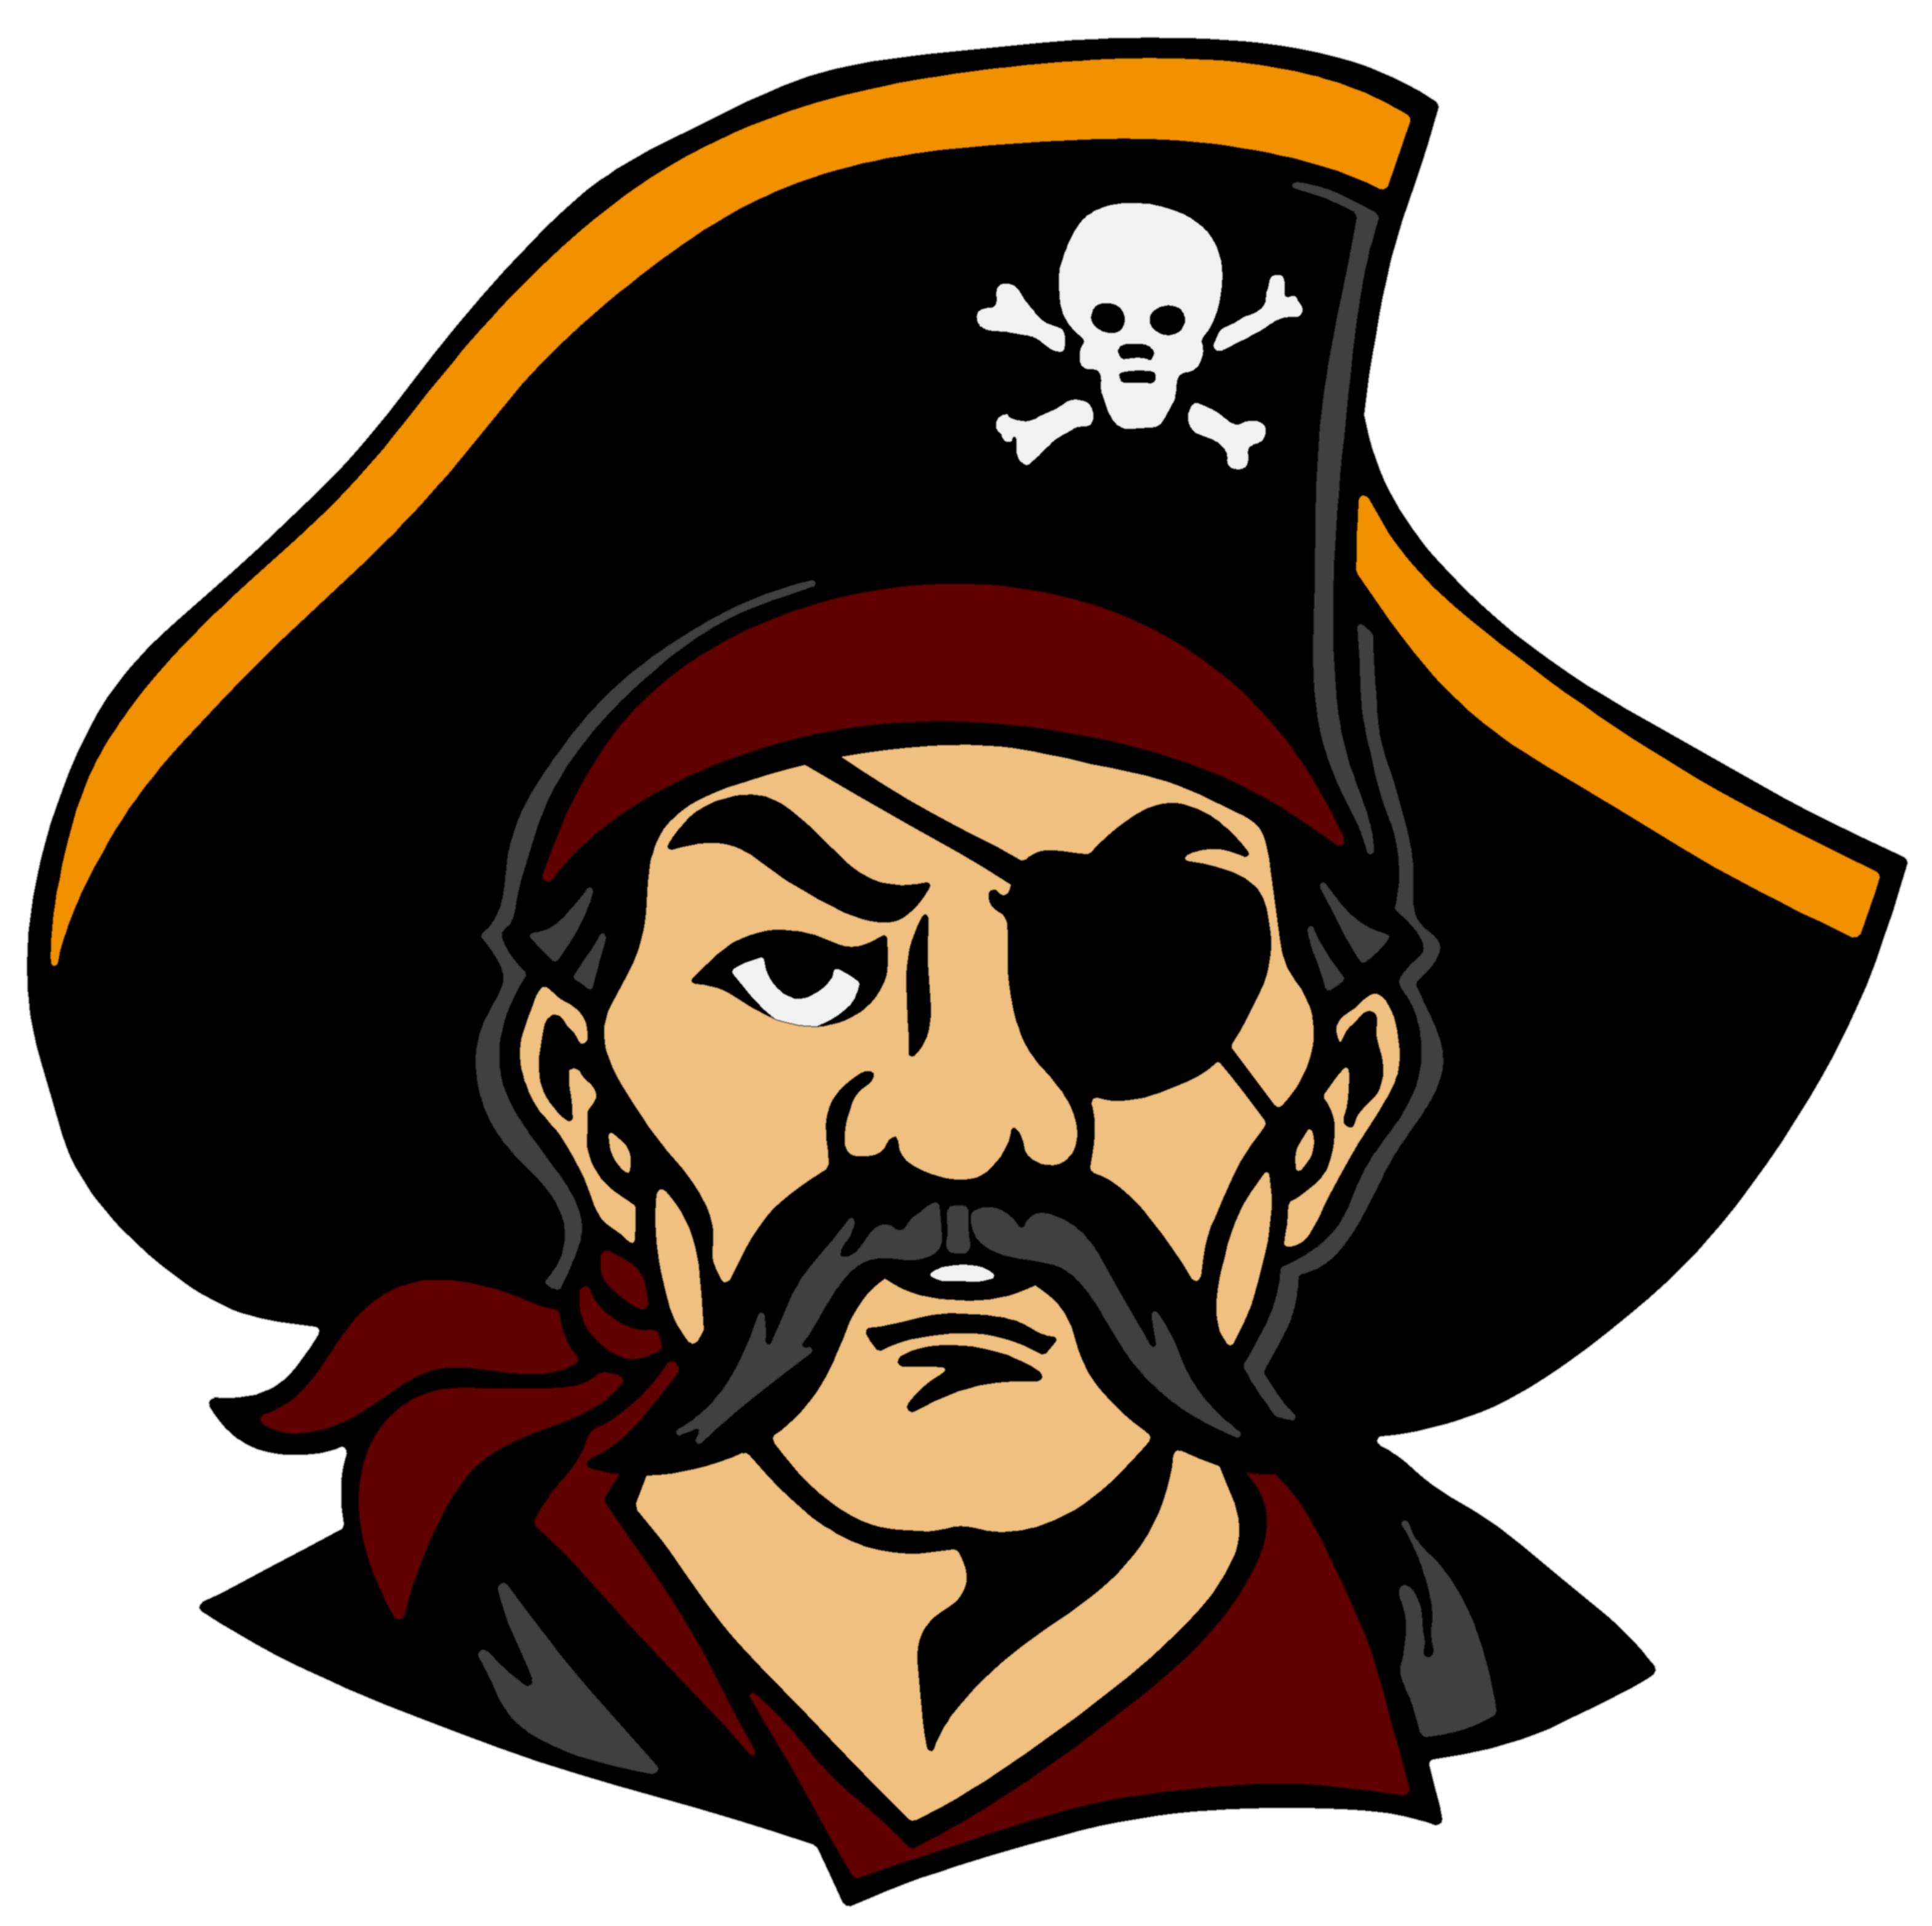 download pirate free download png hq png image freepngimg